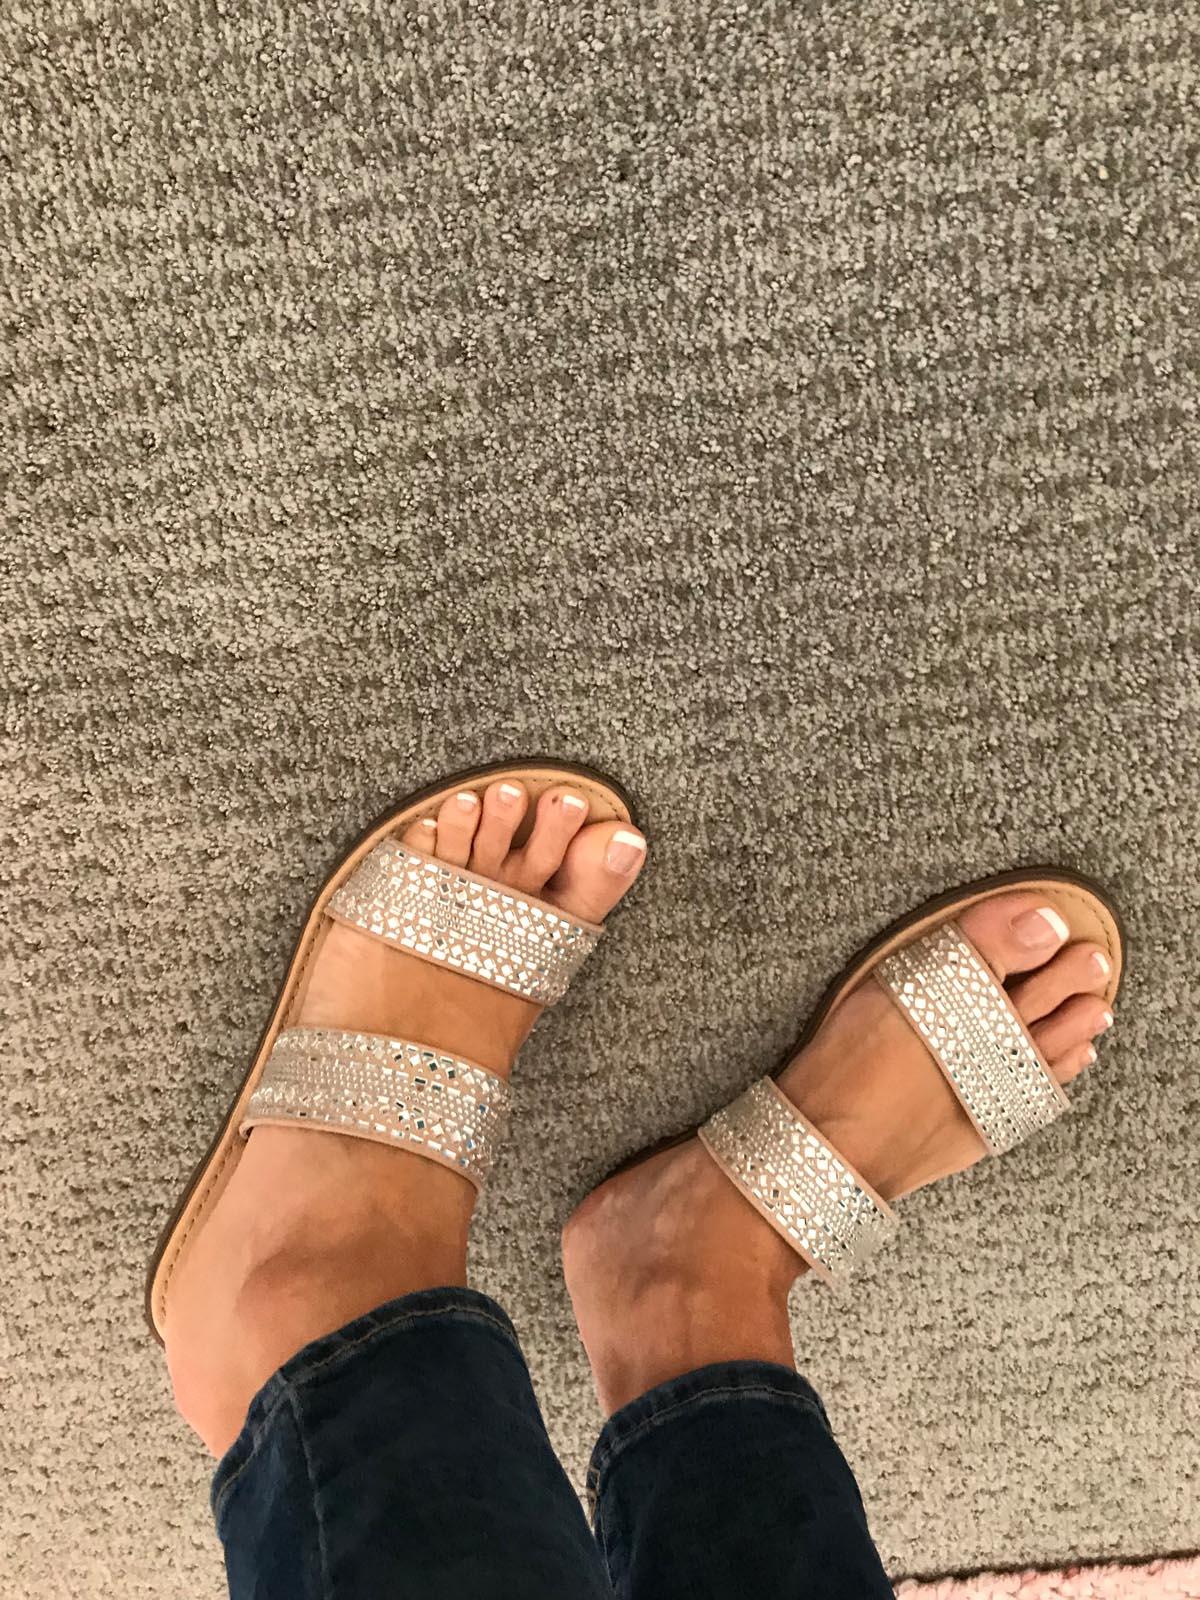 Favorite Sneakers + Sandals on SALE!